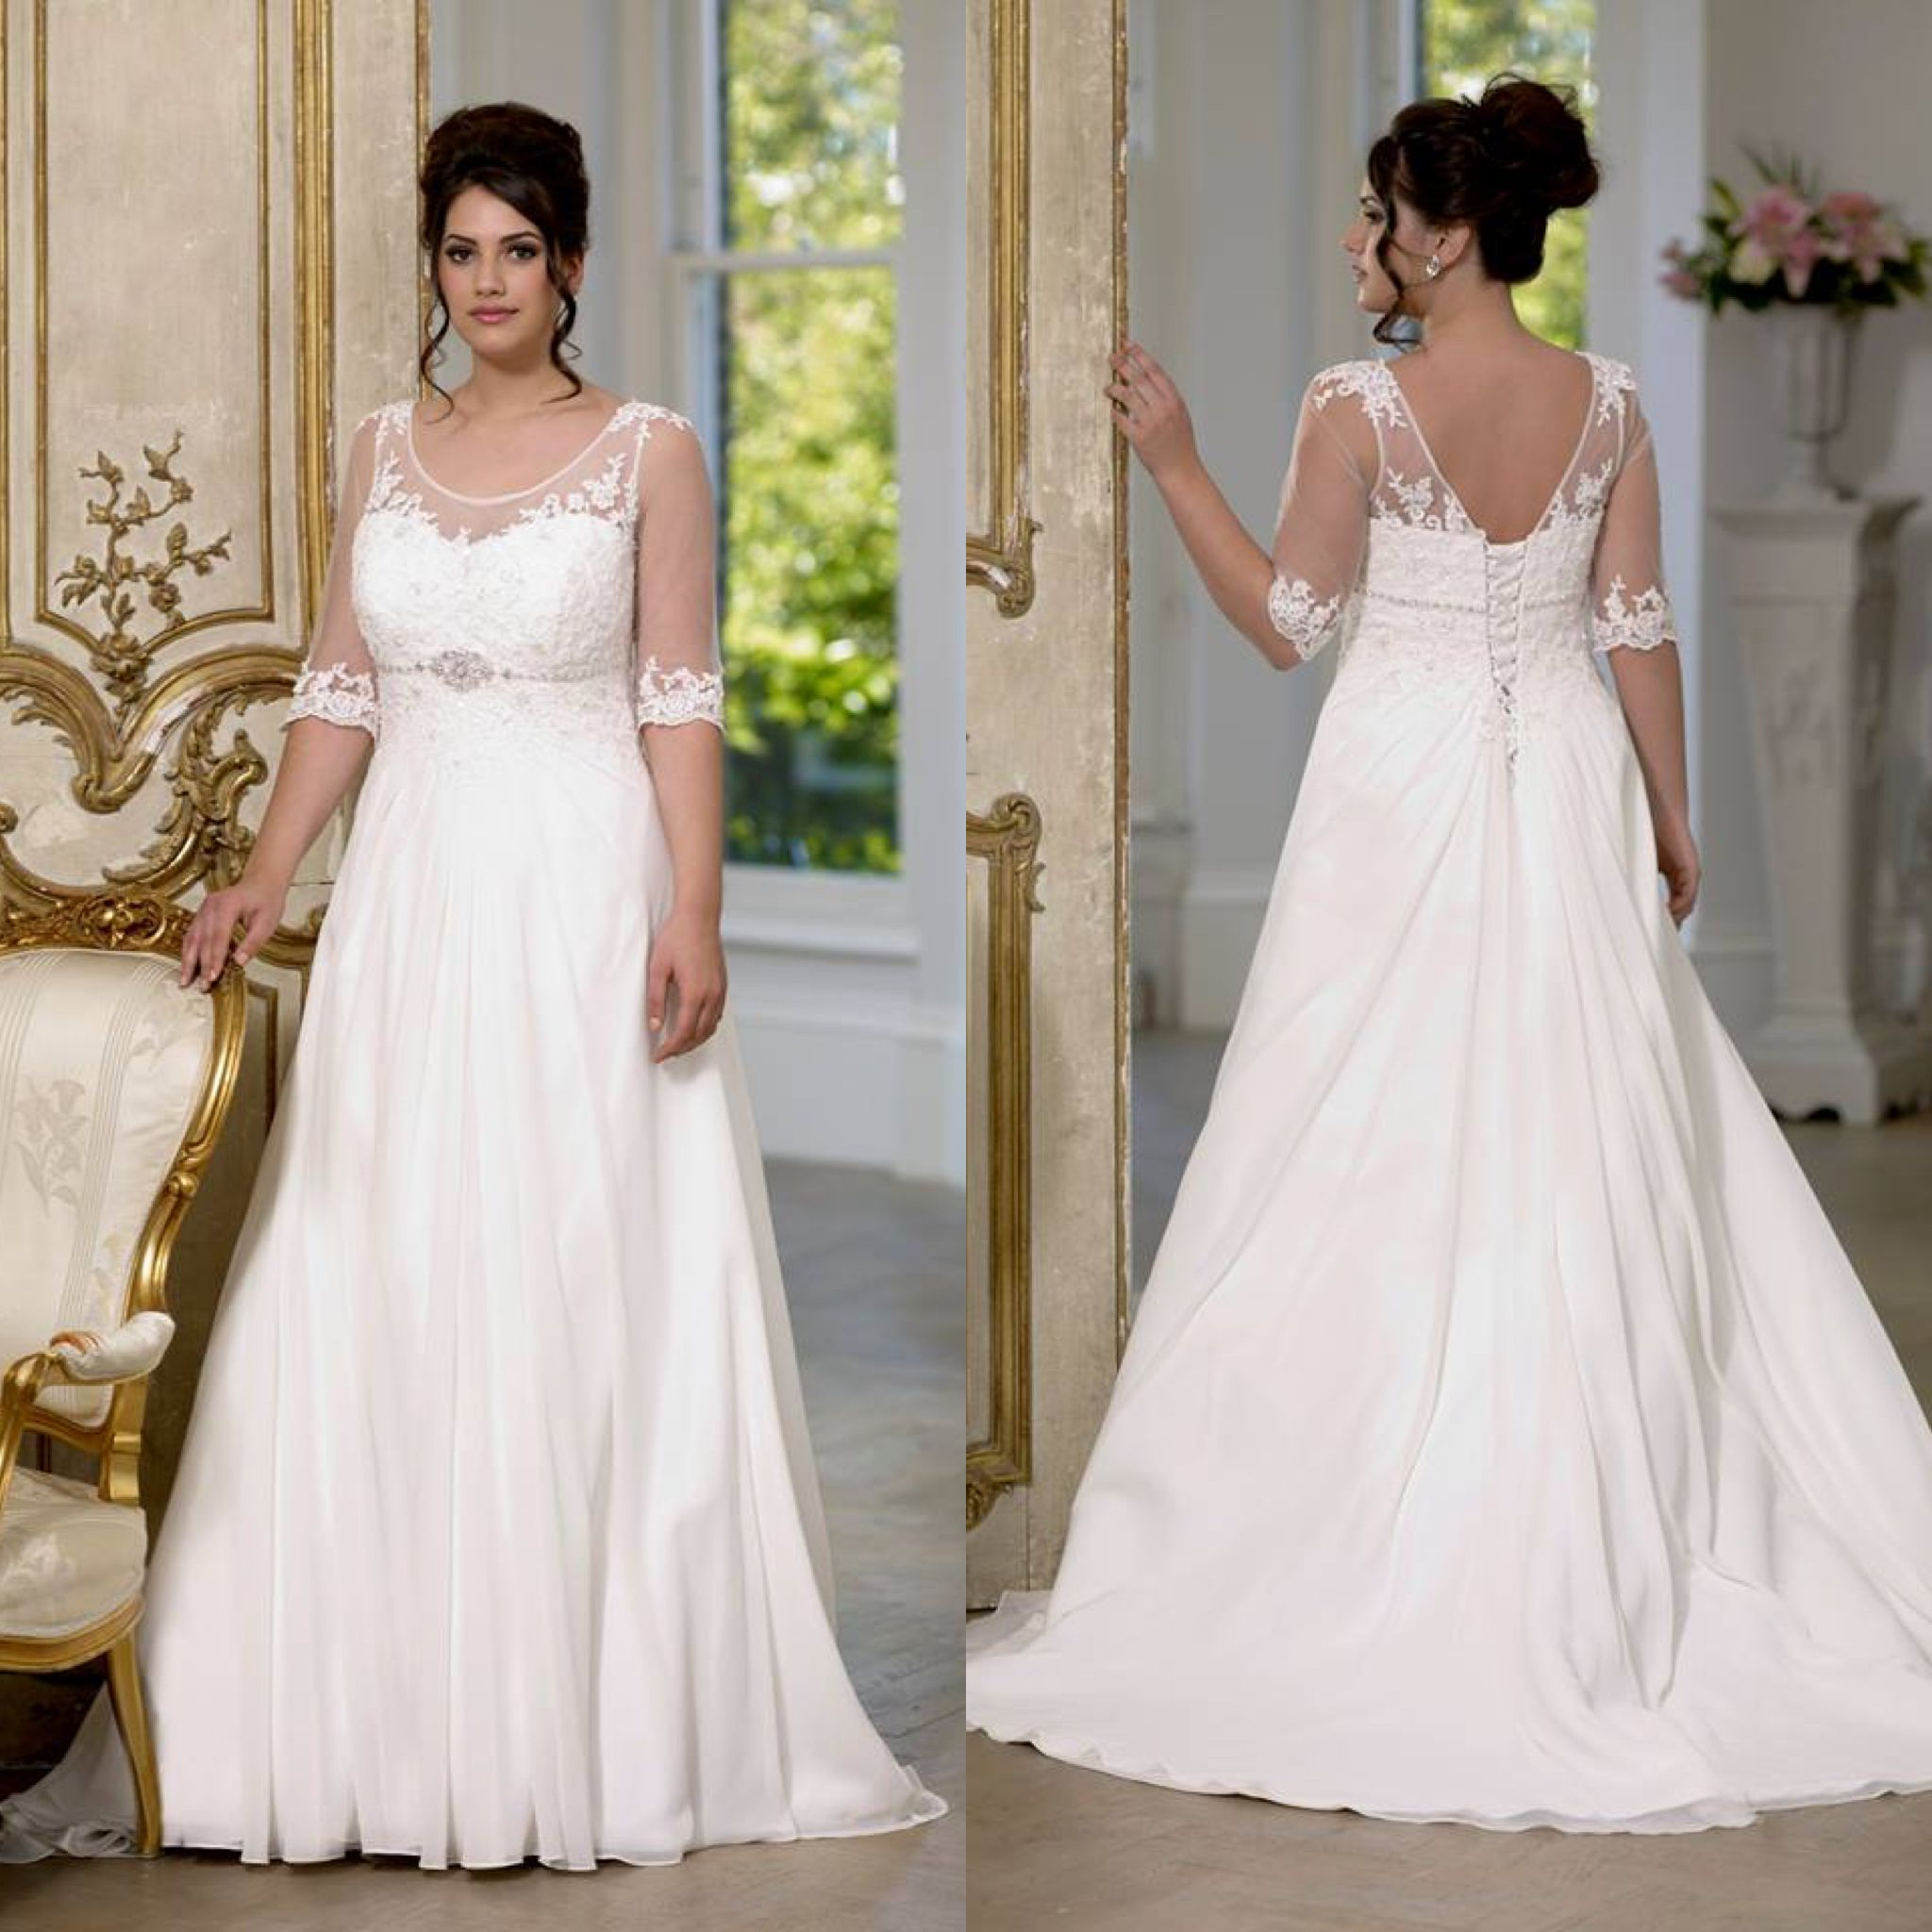 PLUS SIZE SALE DRESS Sonsie By Veromia SON91608 Size 20